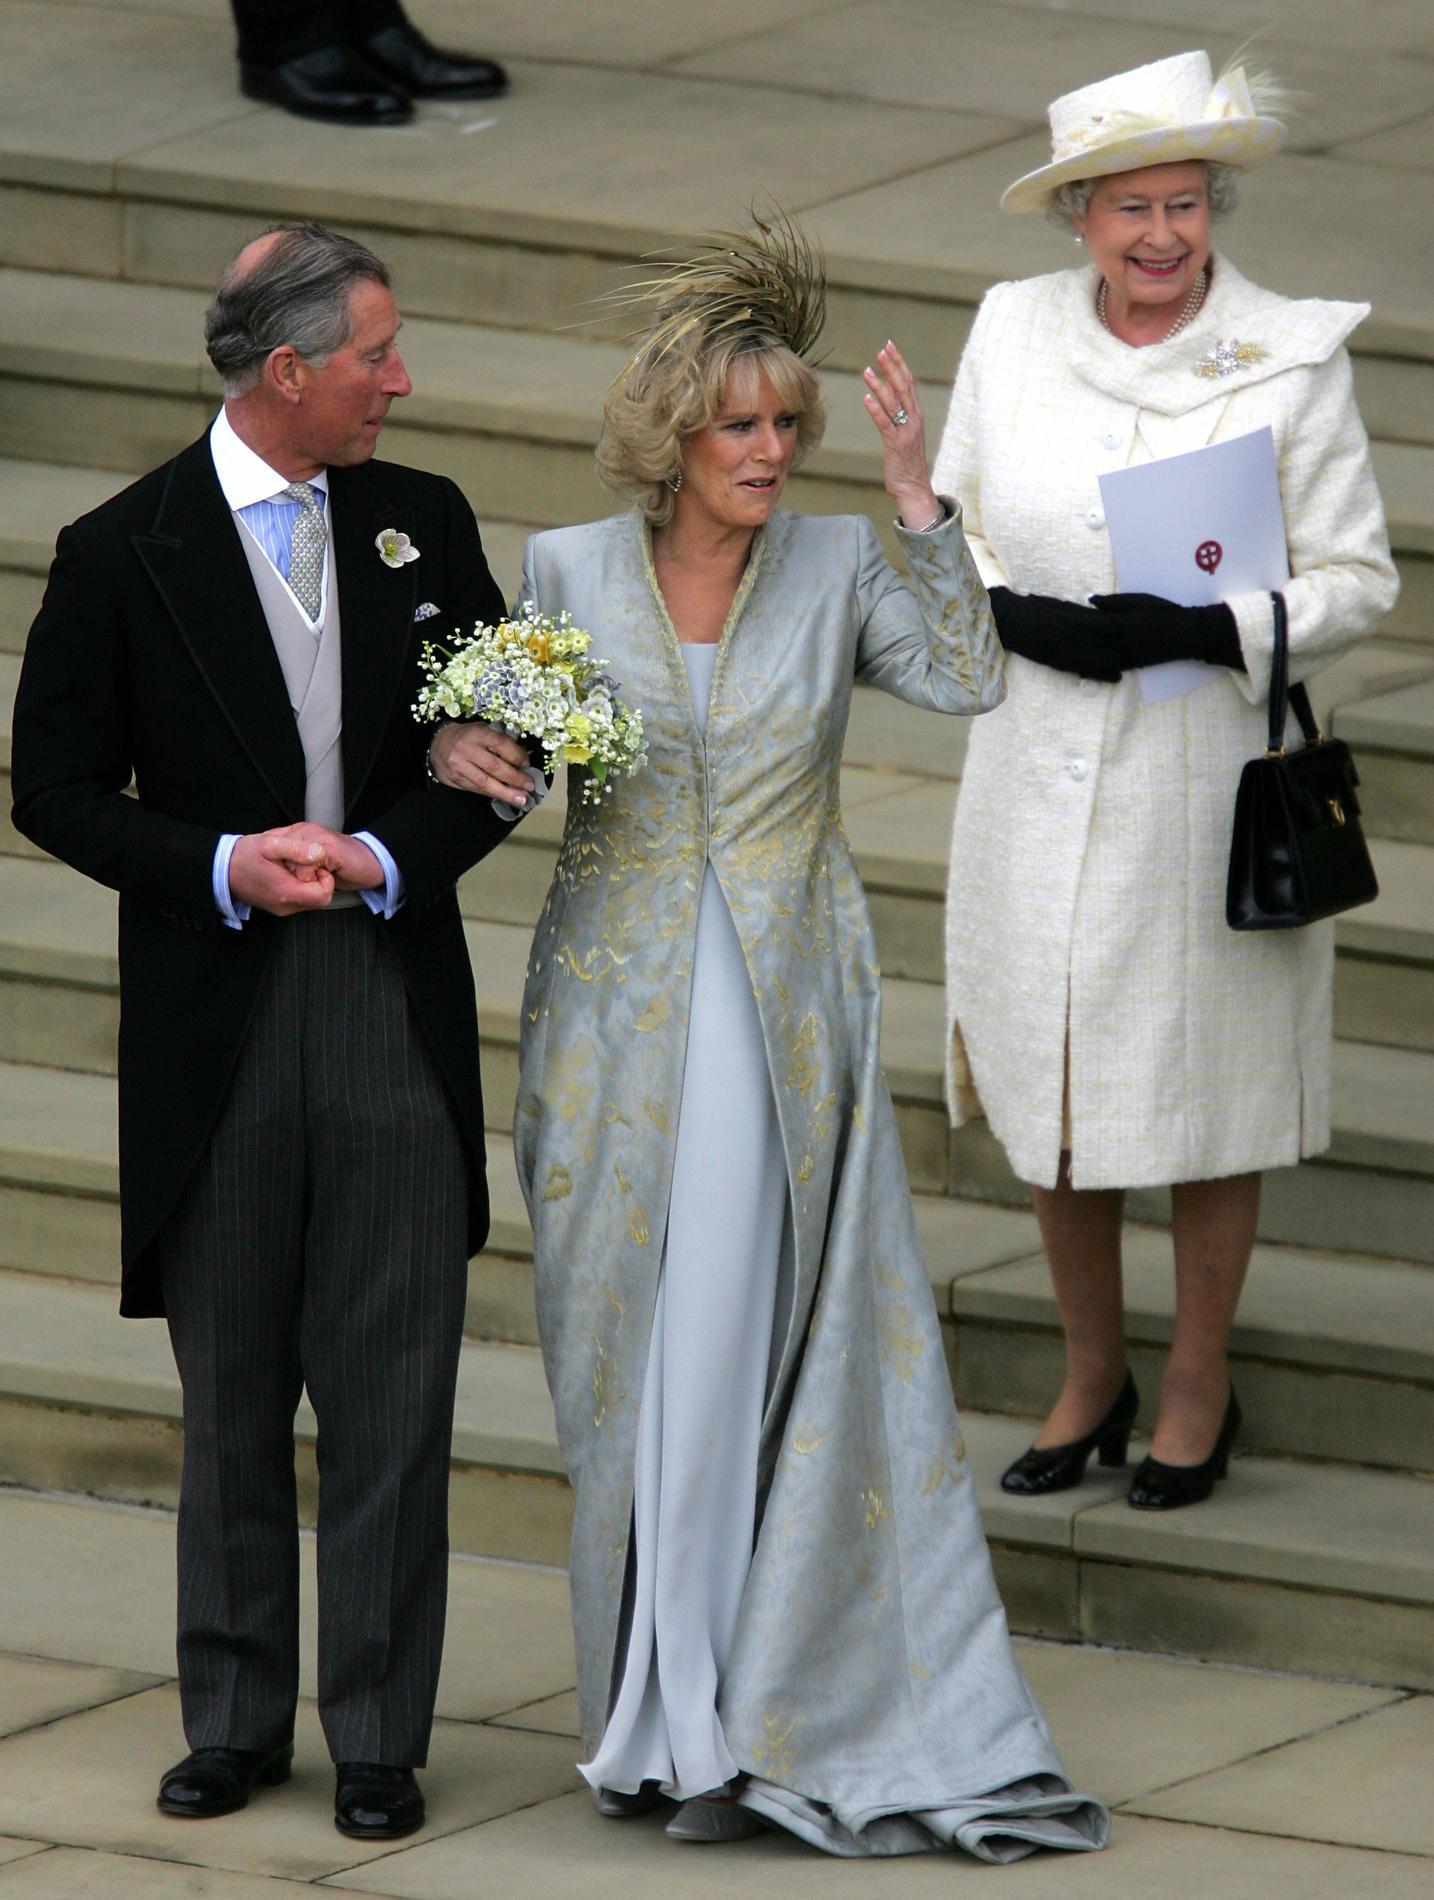 Les tenues de mariage de la reine d\u0027Angleterre Elizabeth II , 2005